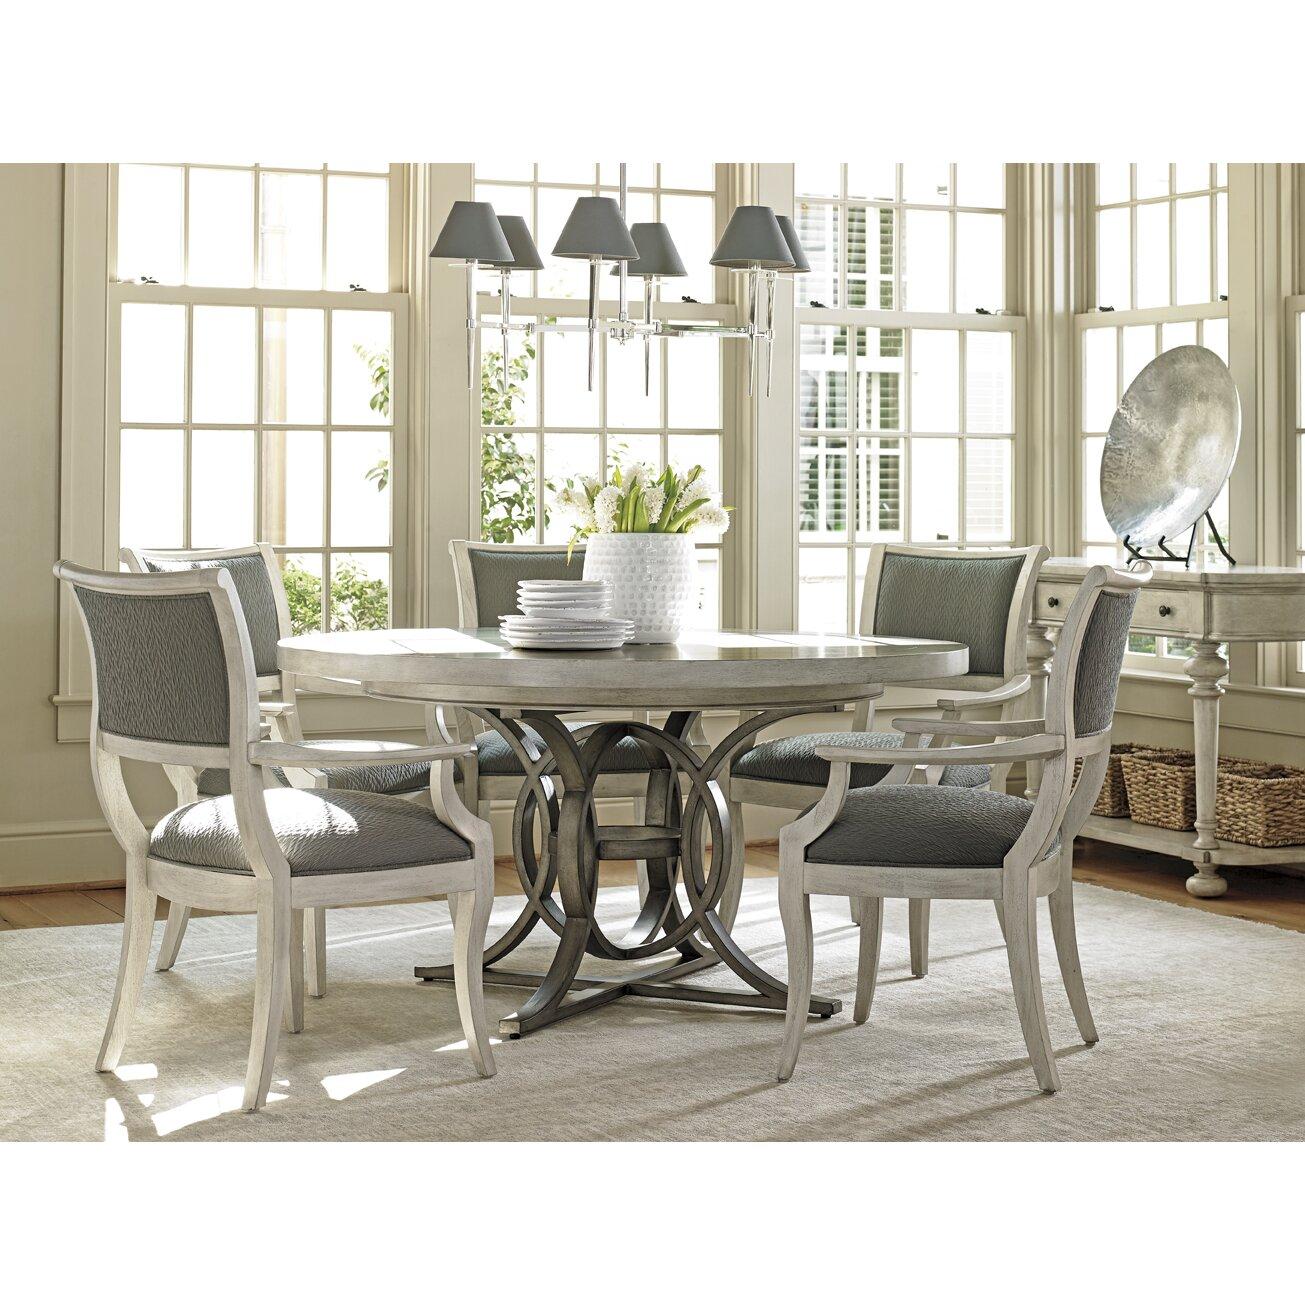 lexington dining room table   Lexington Oyster Bay Calerton Extendable Dining Table ...